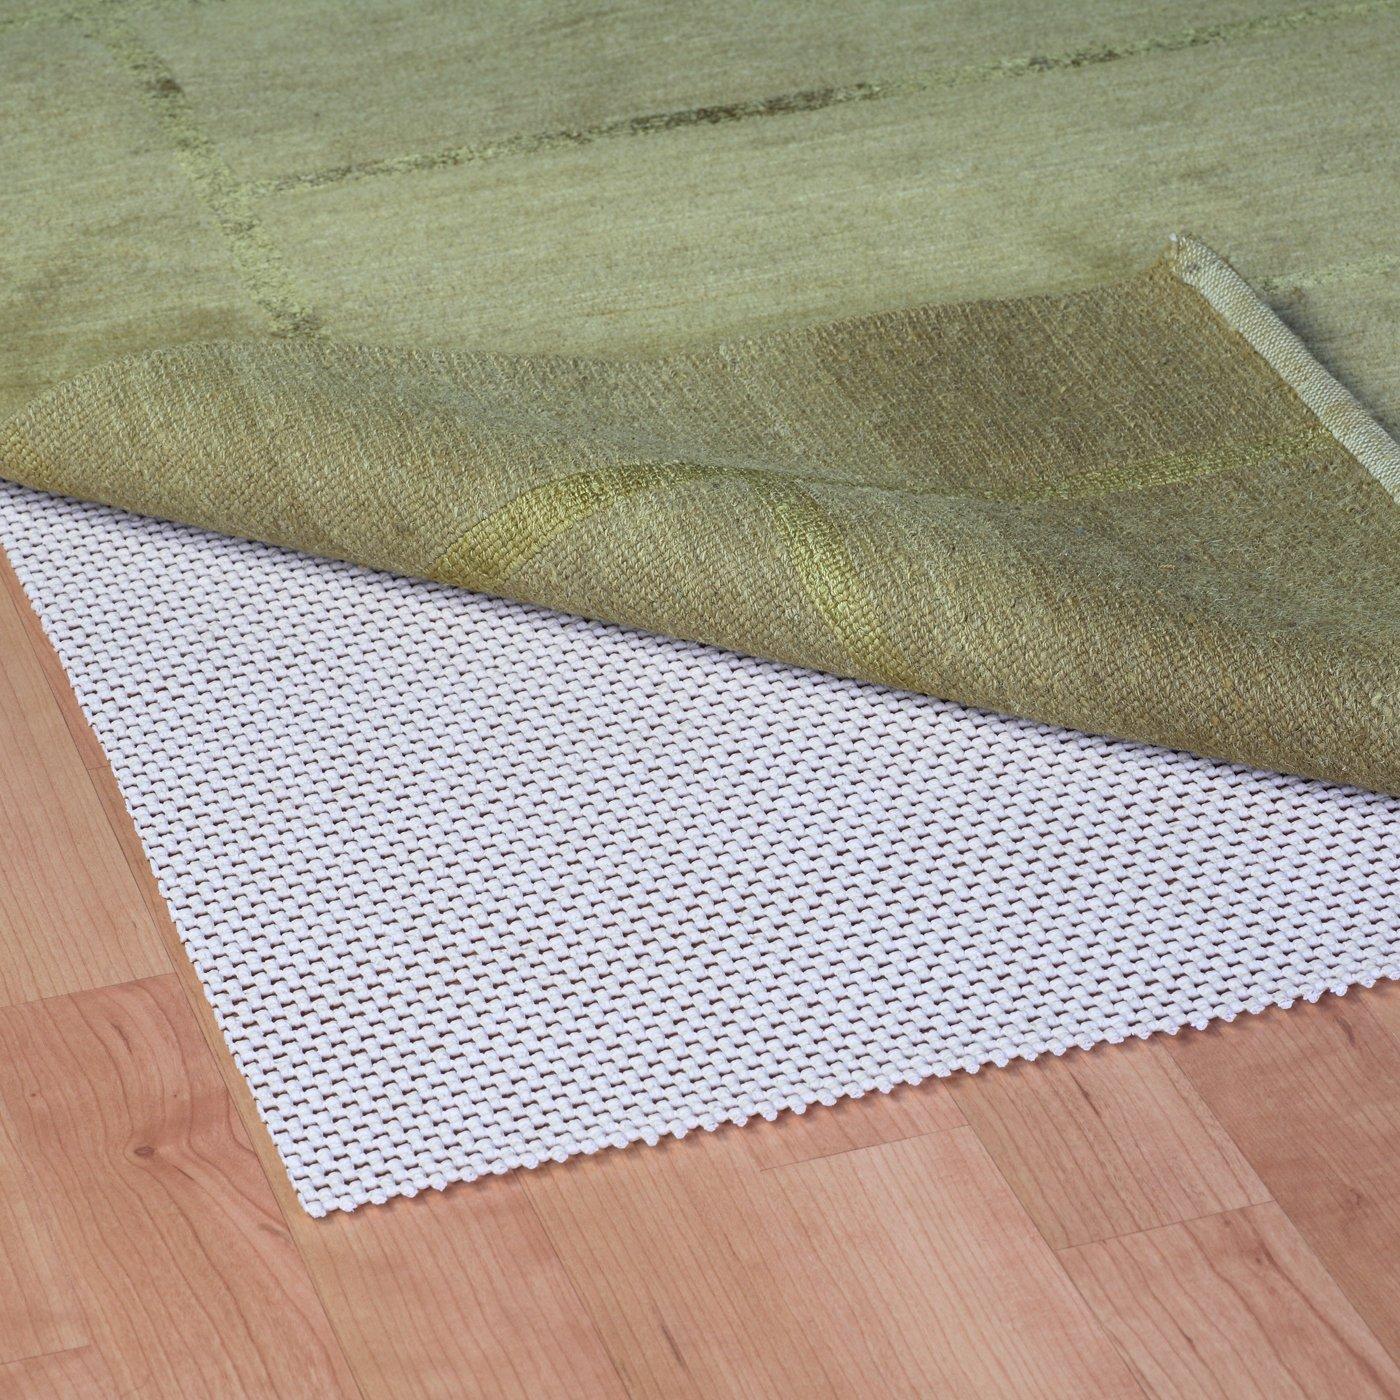 Safest Types Of Rug Pad For Hardwood Floors